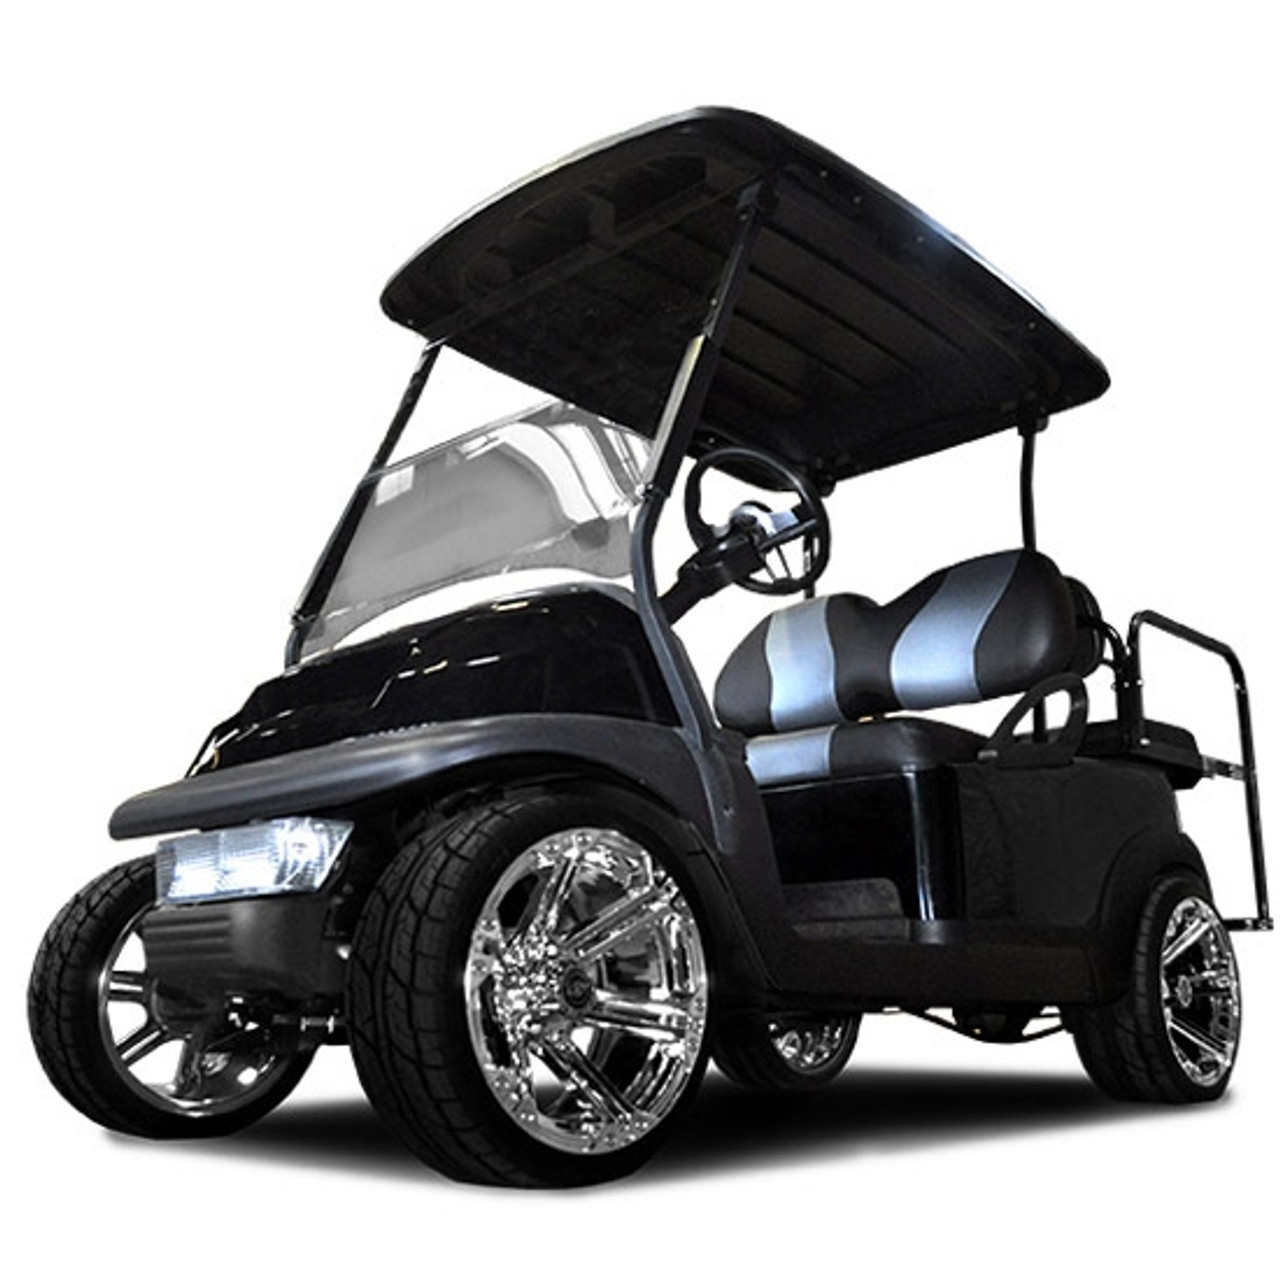 Golf Cart Lift Kits - Best Quality - EZGO, Club Car & More Types Ezgo Golf Carts on lifted golf carts, polaris golf carts, used golf carts, hot golf carts, custom golf carts, luxury golf carts, electric golf carts, concept golf carts, ezgo hunting carts, dodge golf carts, honda golf carts, solar panels for golf carts, gas golf carts, ebay golf carts, accessories golf carts, utility golf carts, golf push carts, john deere golf carts, commercial golf carts, yamaha golf carts,